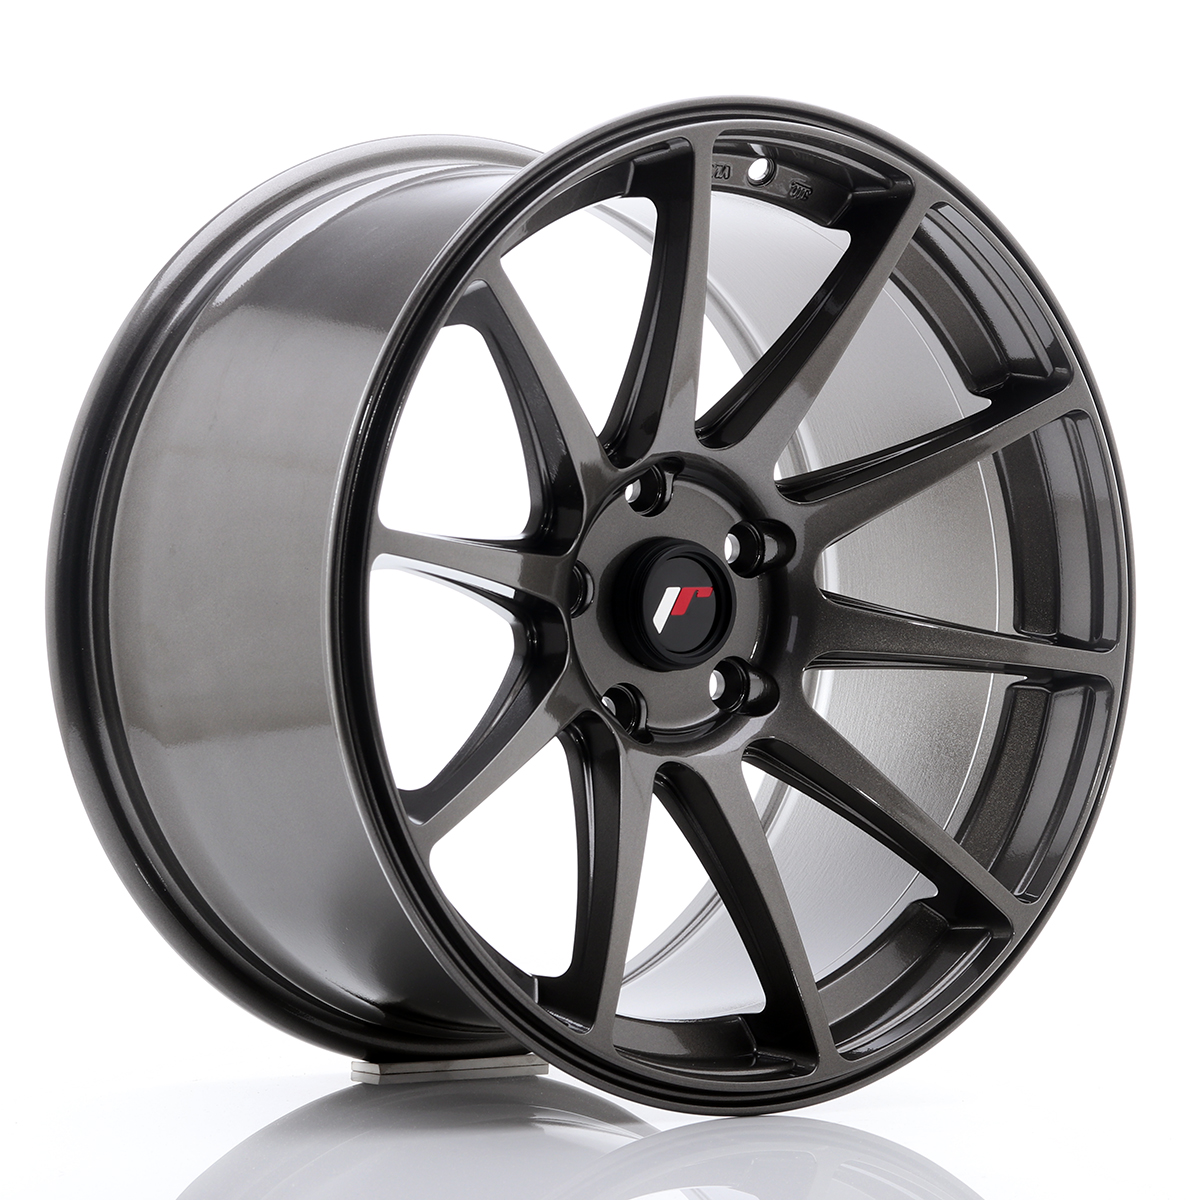 Japan Racing JR Wheels JR11 18x9.5 ET30 5x114.3 5x112 Hyper Gray